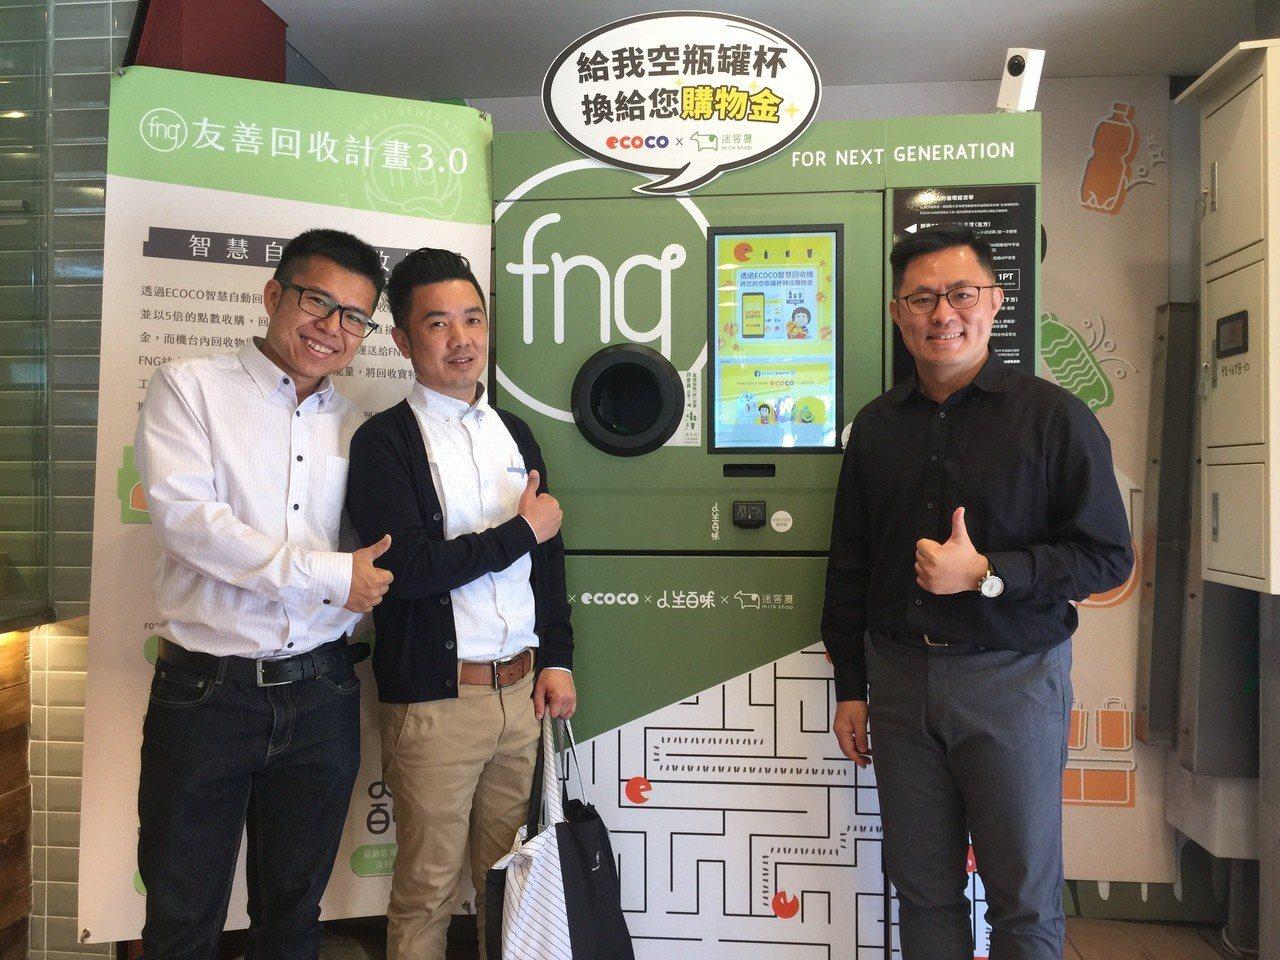 ECOCO共同創辦人吳昌聯(左起)、FNG世代設計創辦人蔡僅鵬、ECOCO共同創...